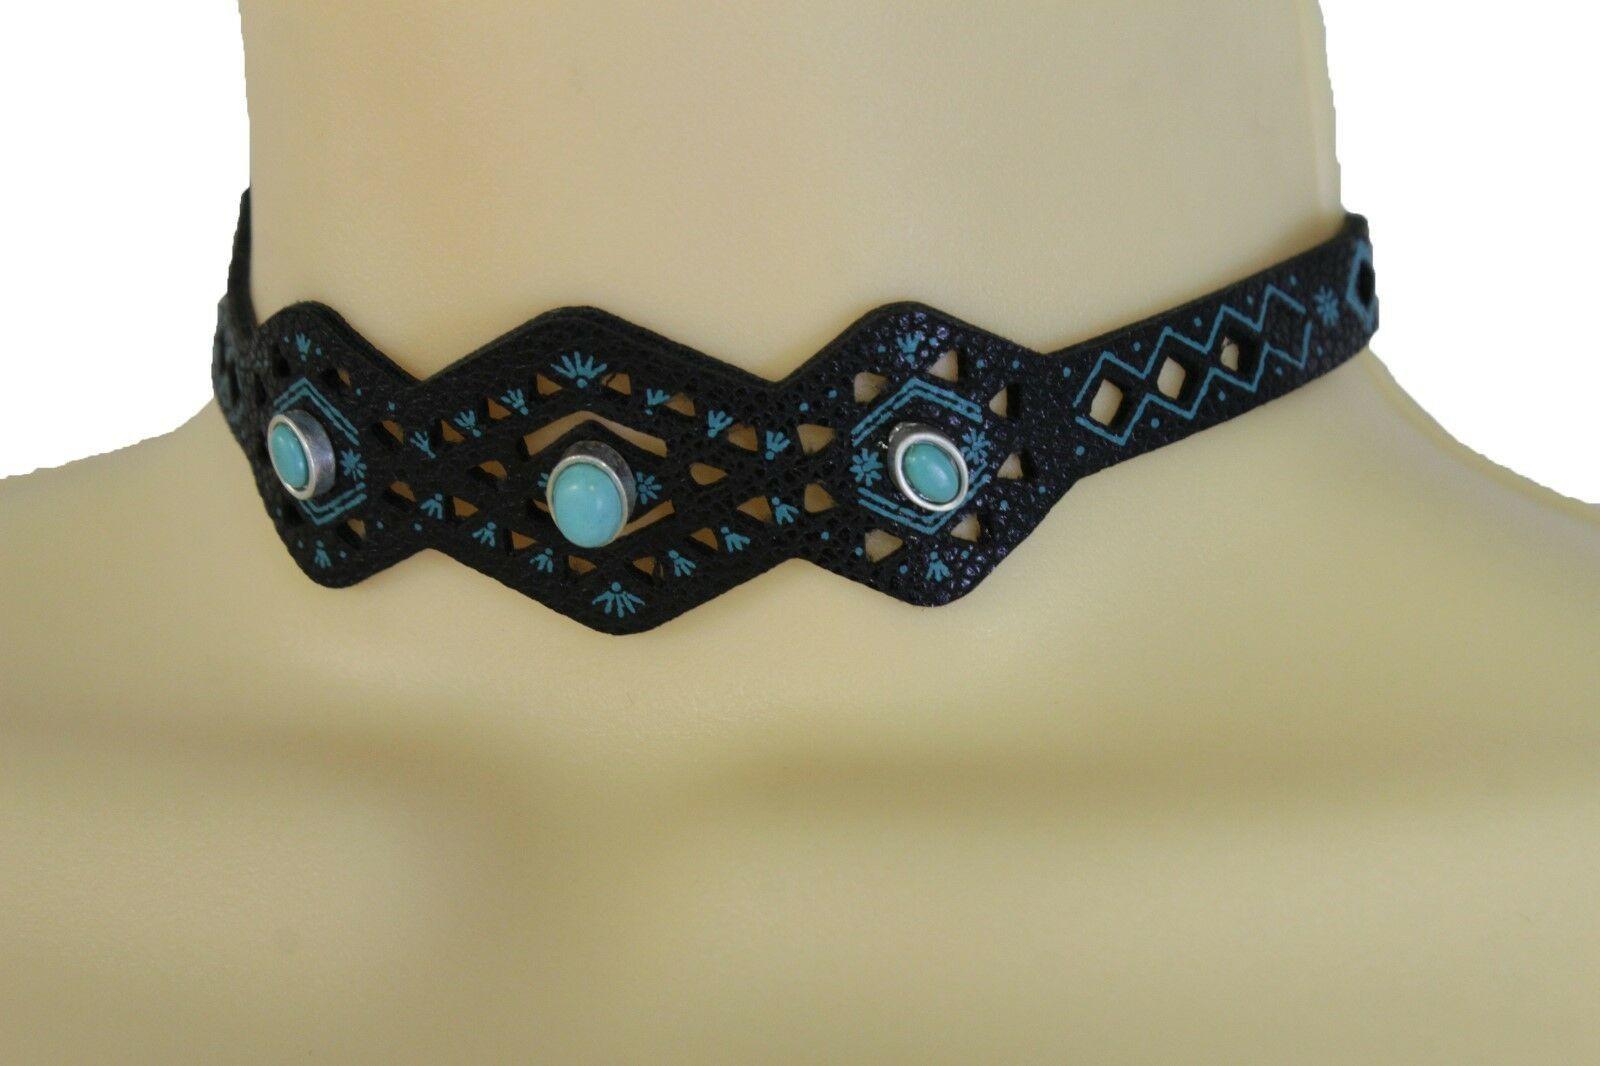 Damen Schwarz Kunstleder Halsband Ethno Boho Vintage Blau Perlen